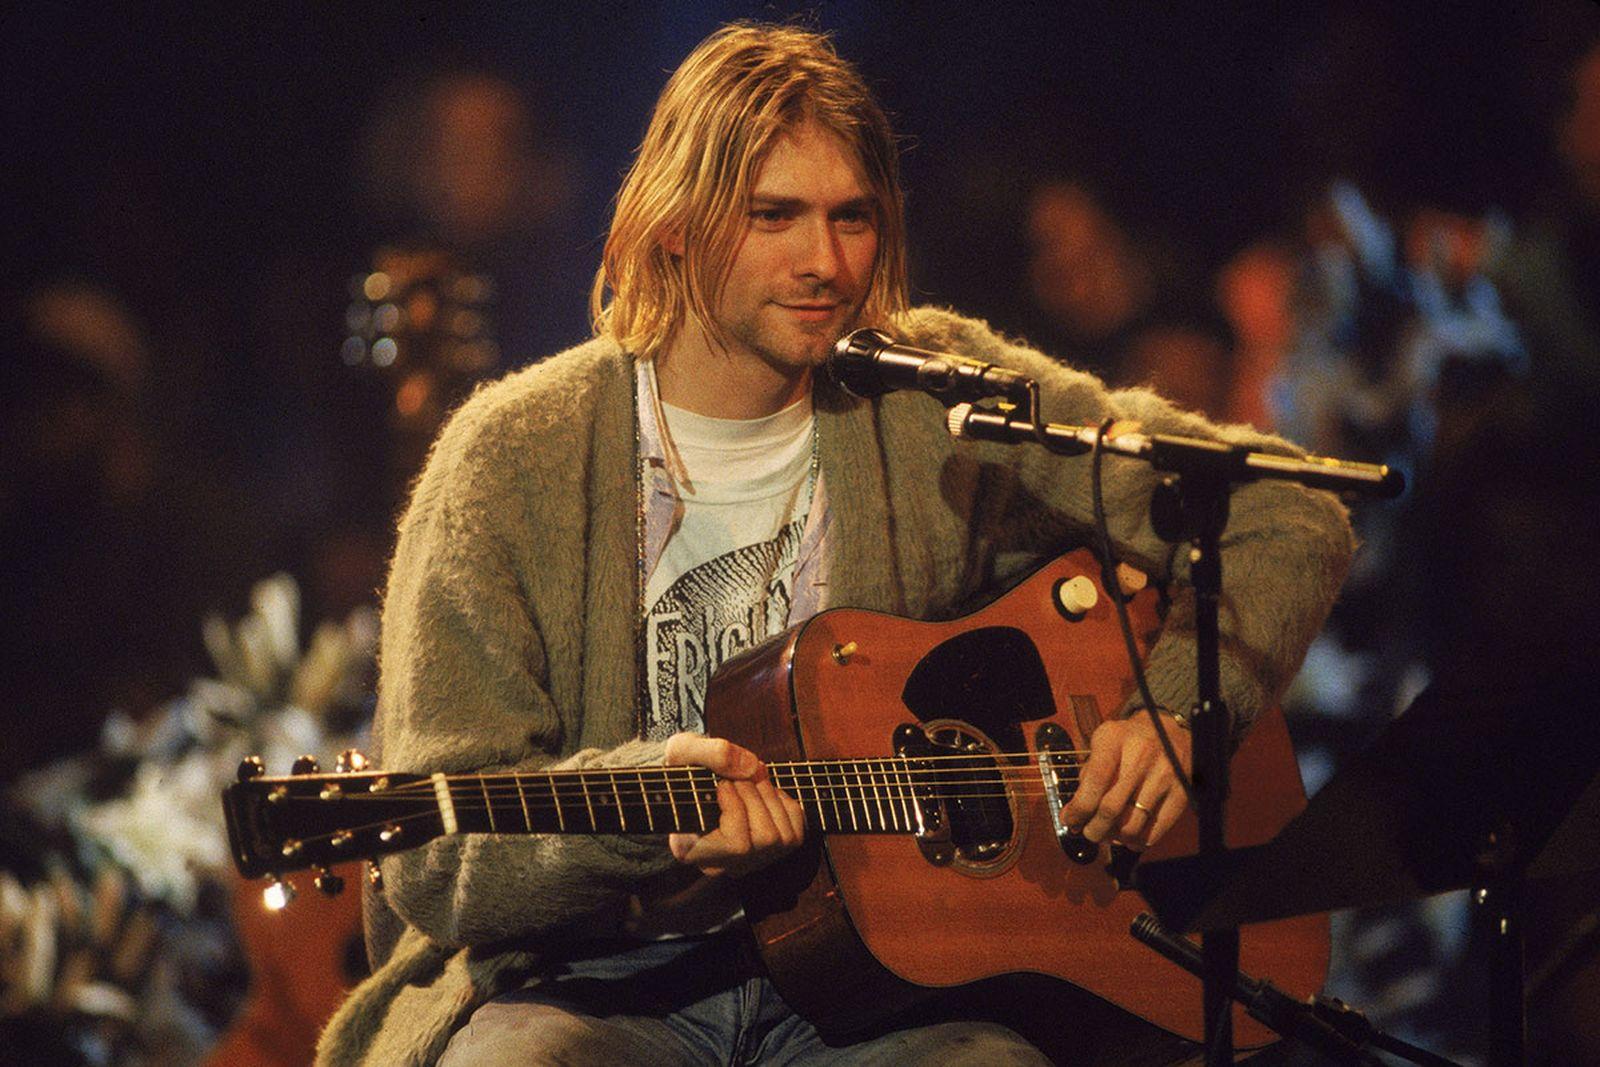 Kurt Cobain 'MTV Unplugged' olive cardigan, guitar